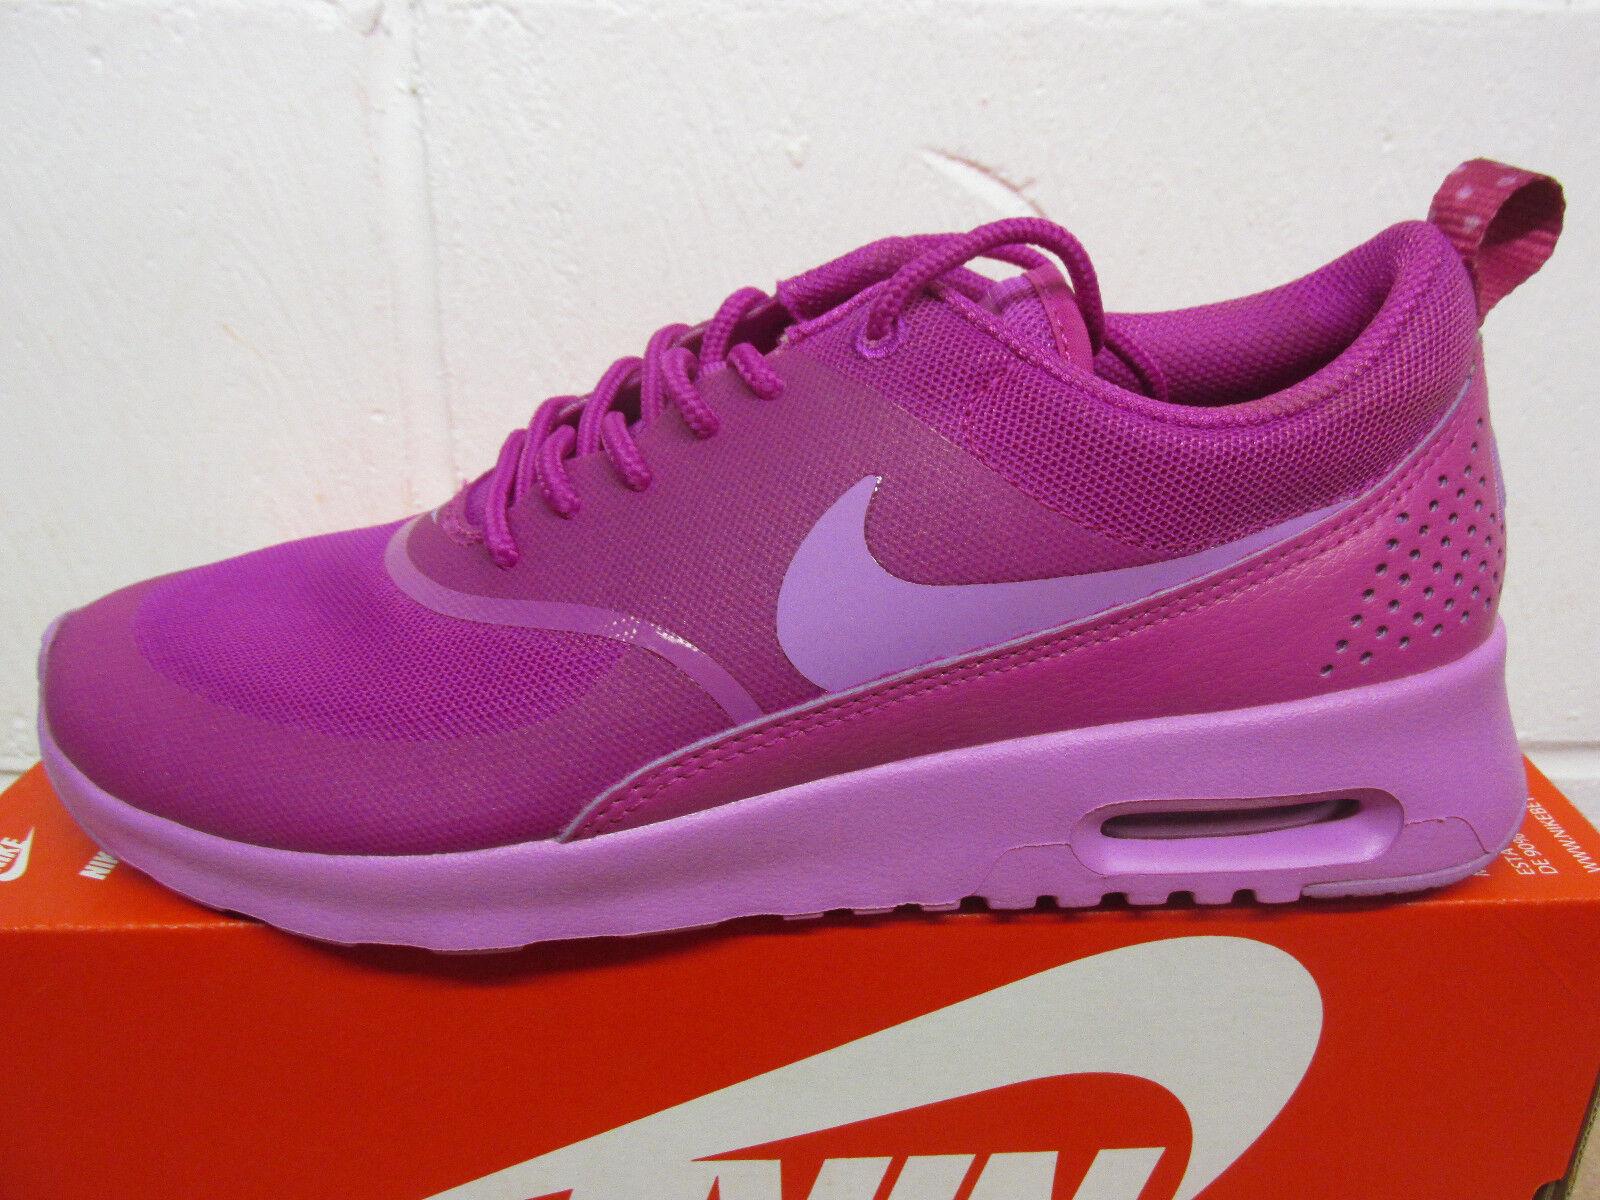 Nike Da Donna Air Max Thea Sautope Da Ginnastica correrening 599409 502 Sautope Da Ginnastica Sautope SVENDITA Sautope classeiche da uomo